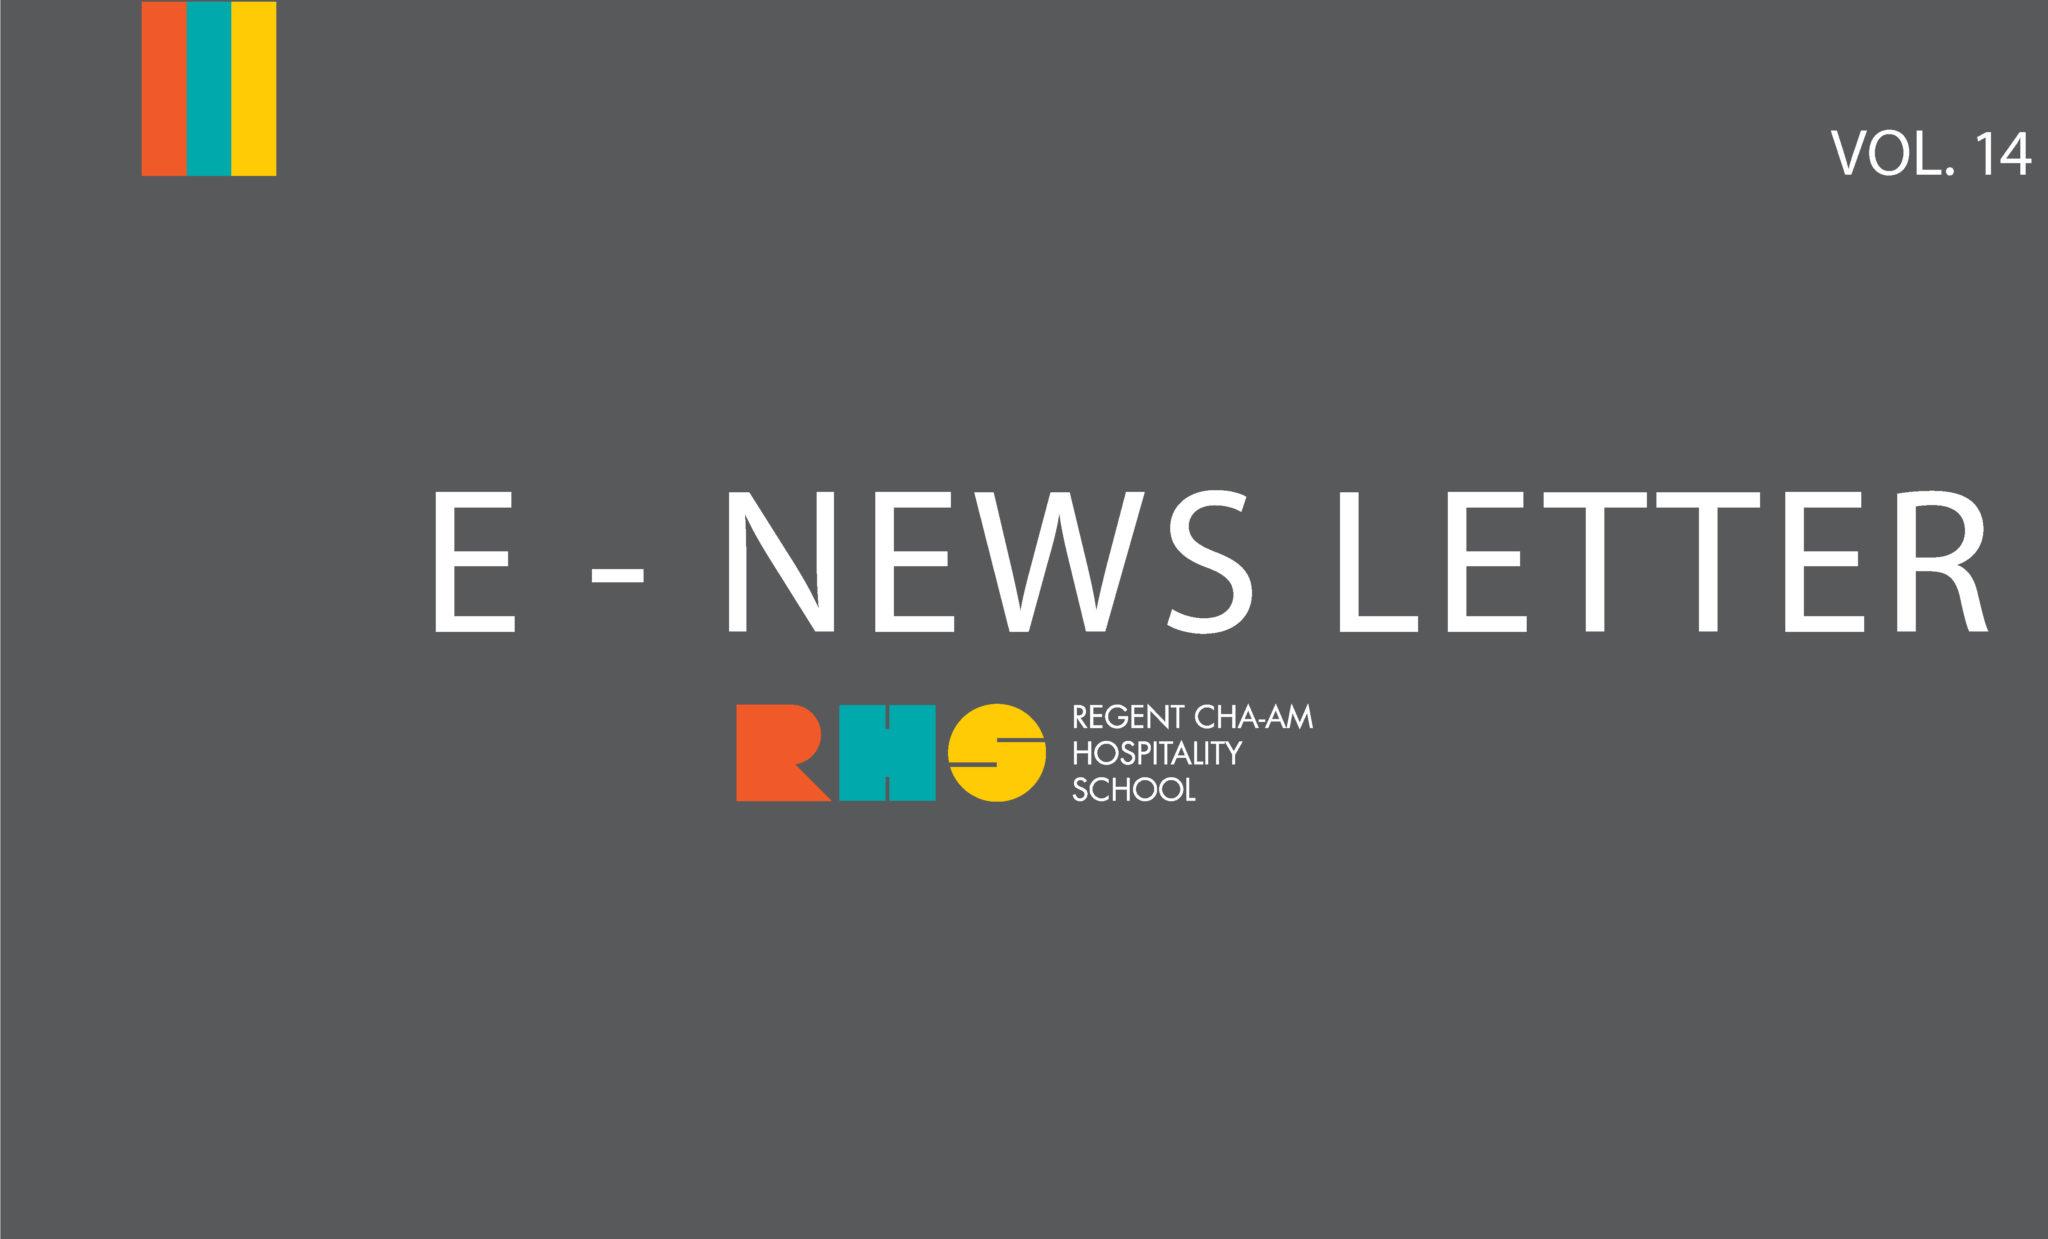 RHS E-News Letter Vol.14